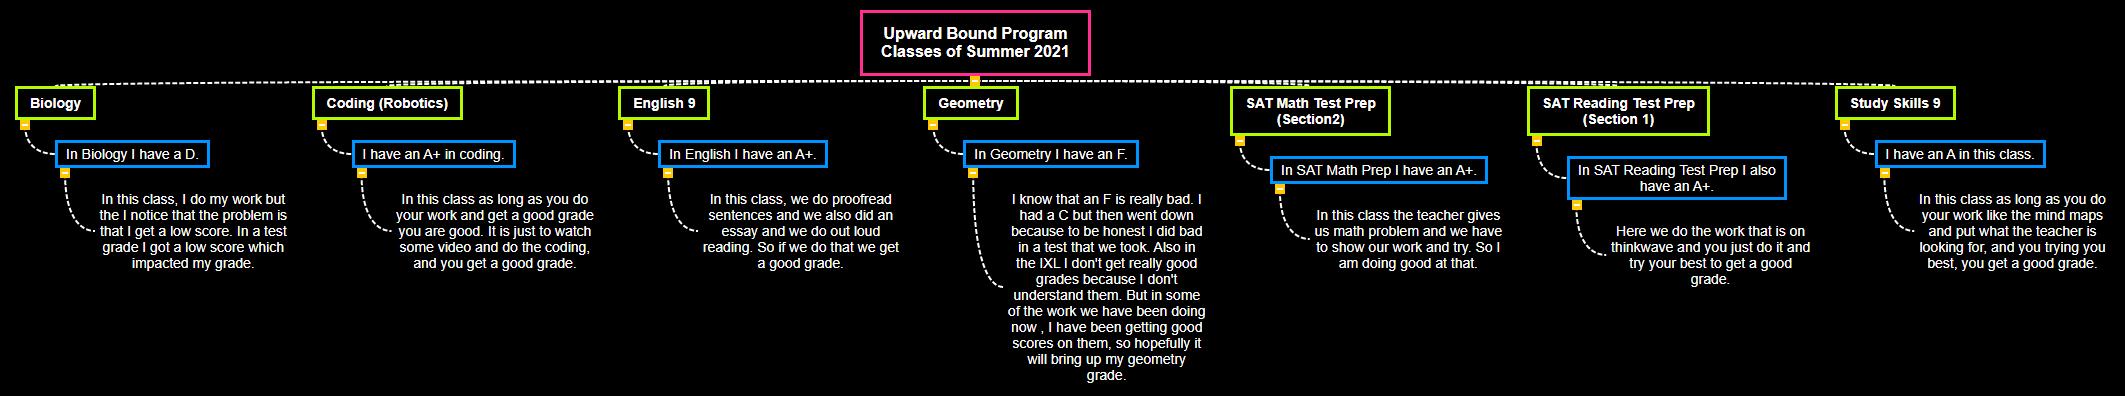 Upward Bound Program Classes of Summer 2021 WBS